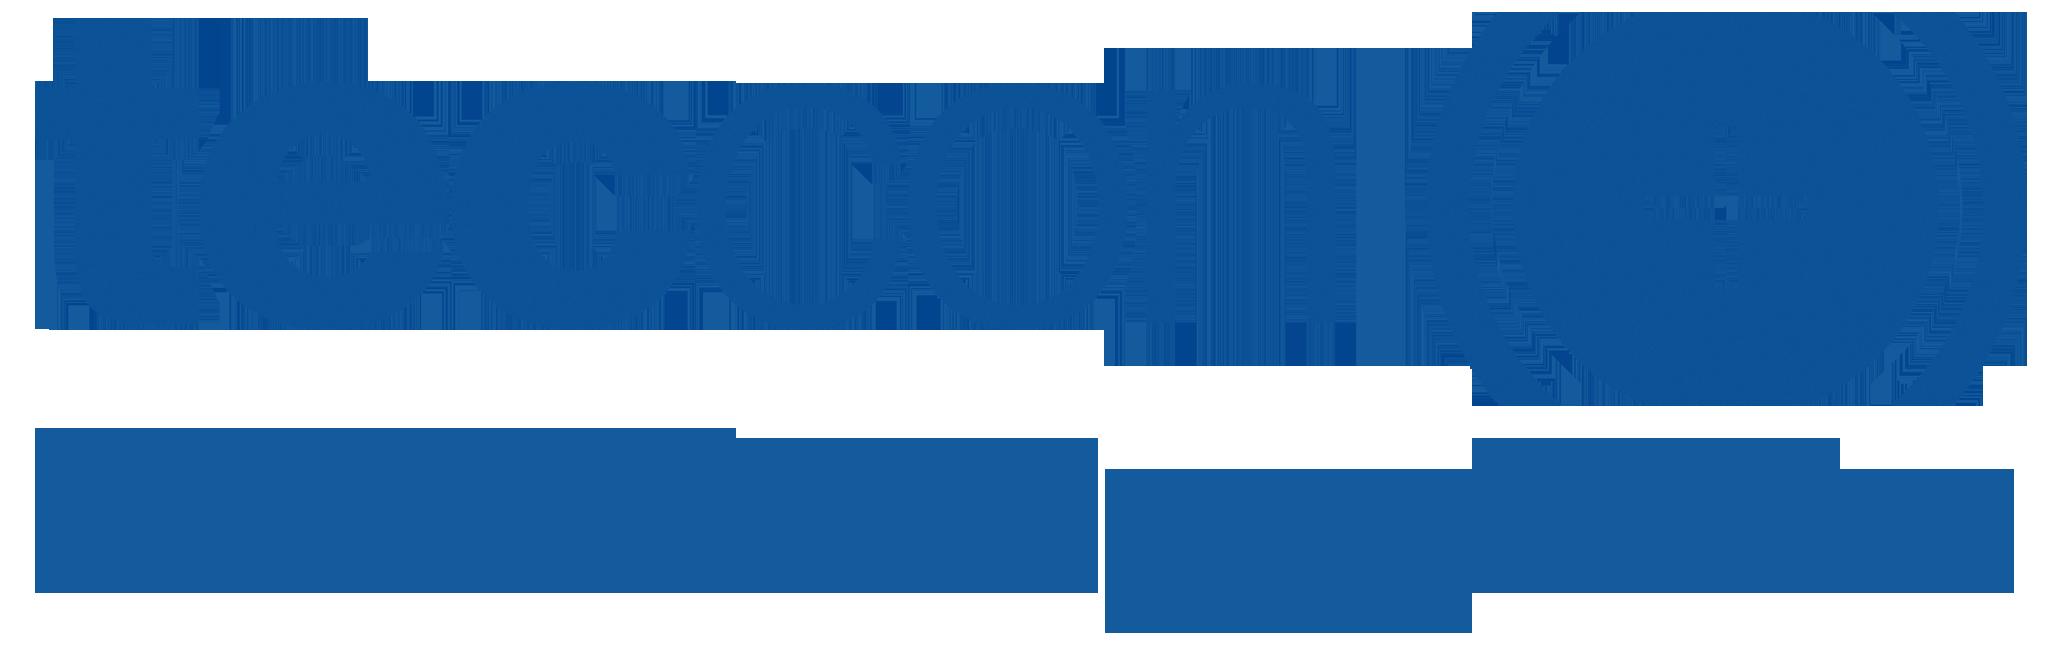 teccon-landmeter-blauw